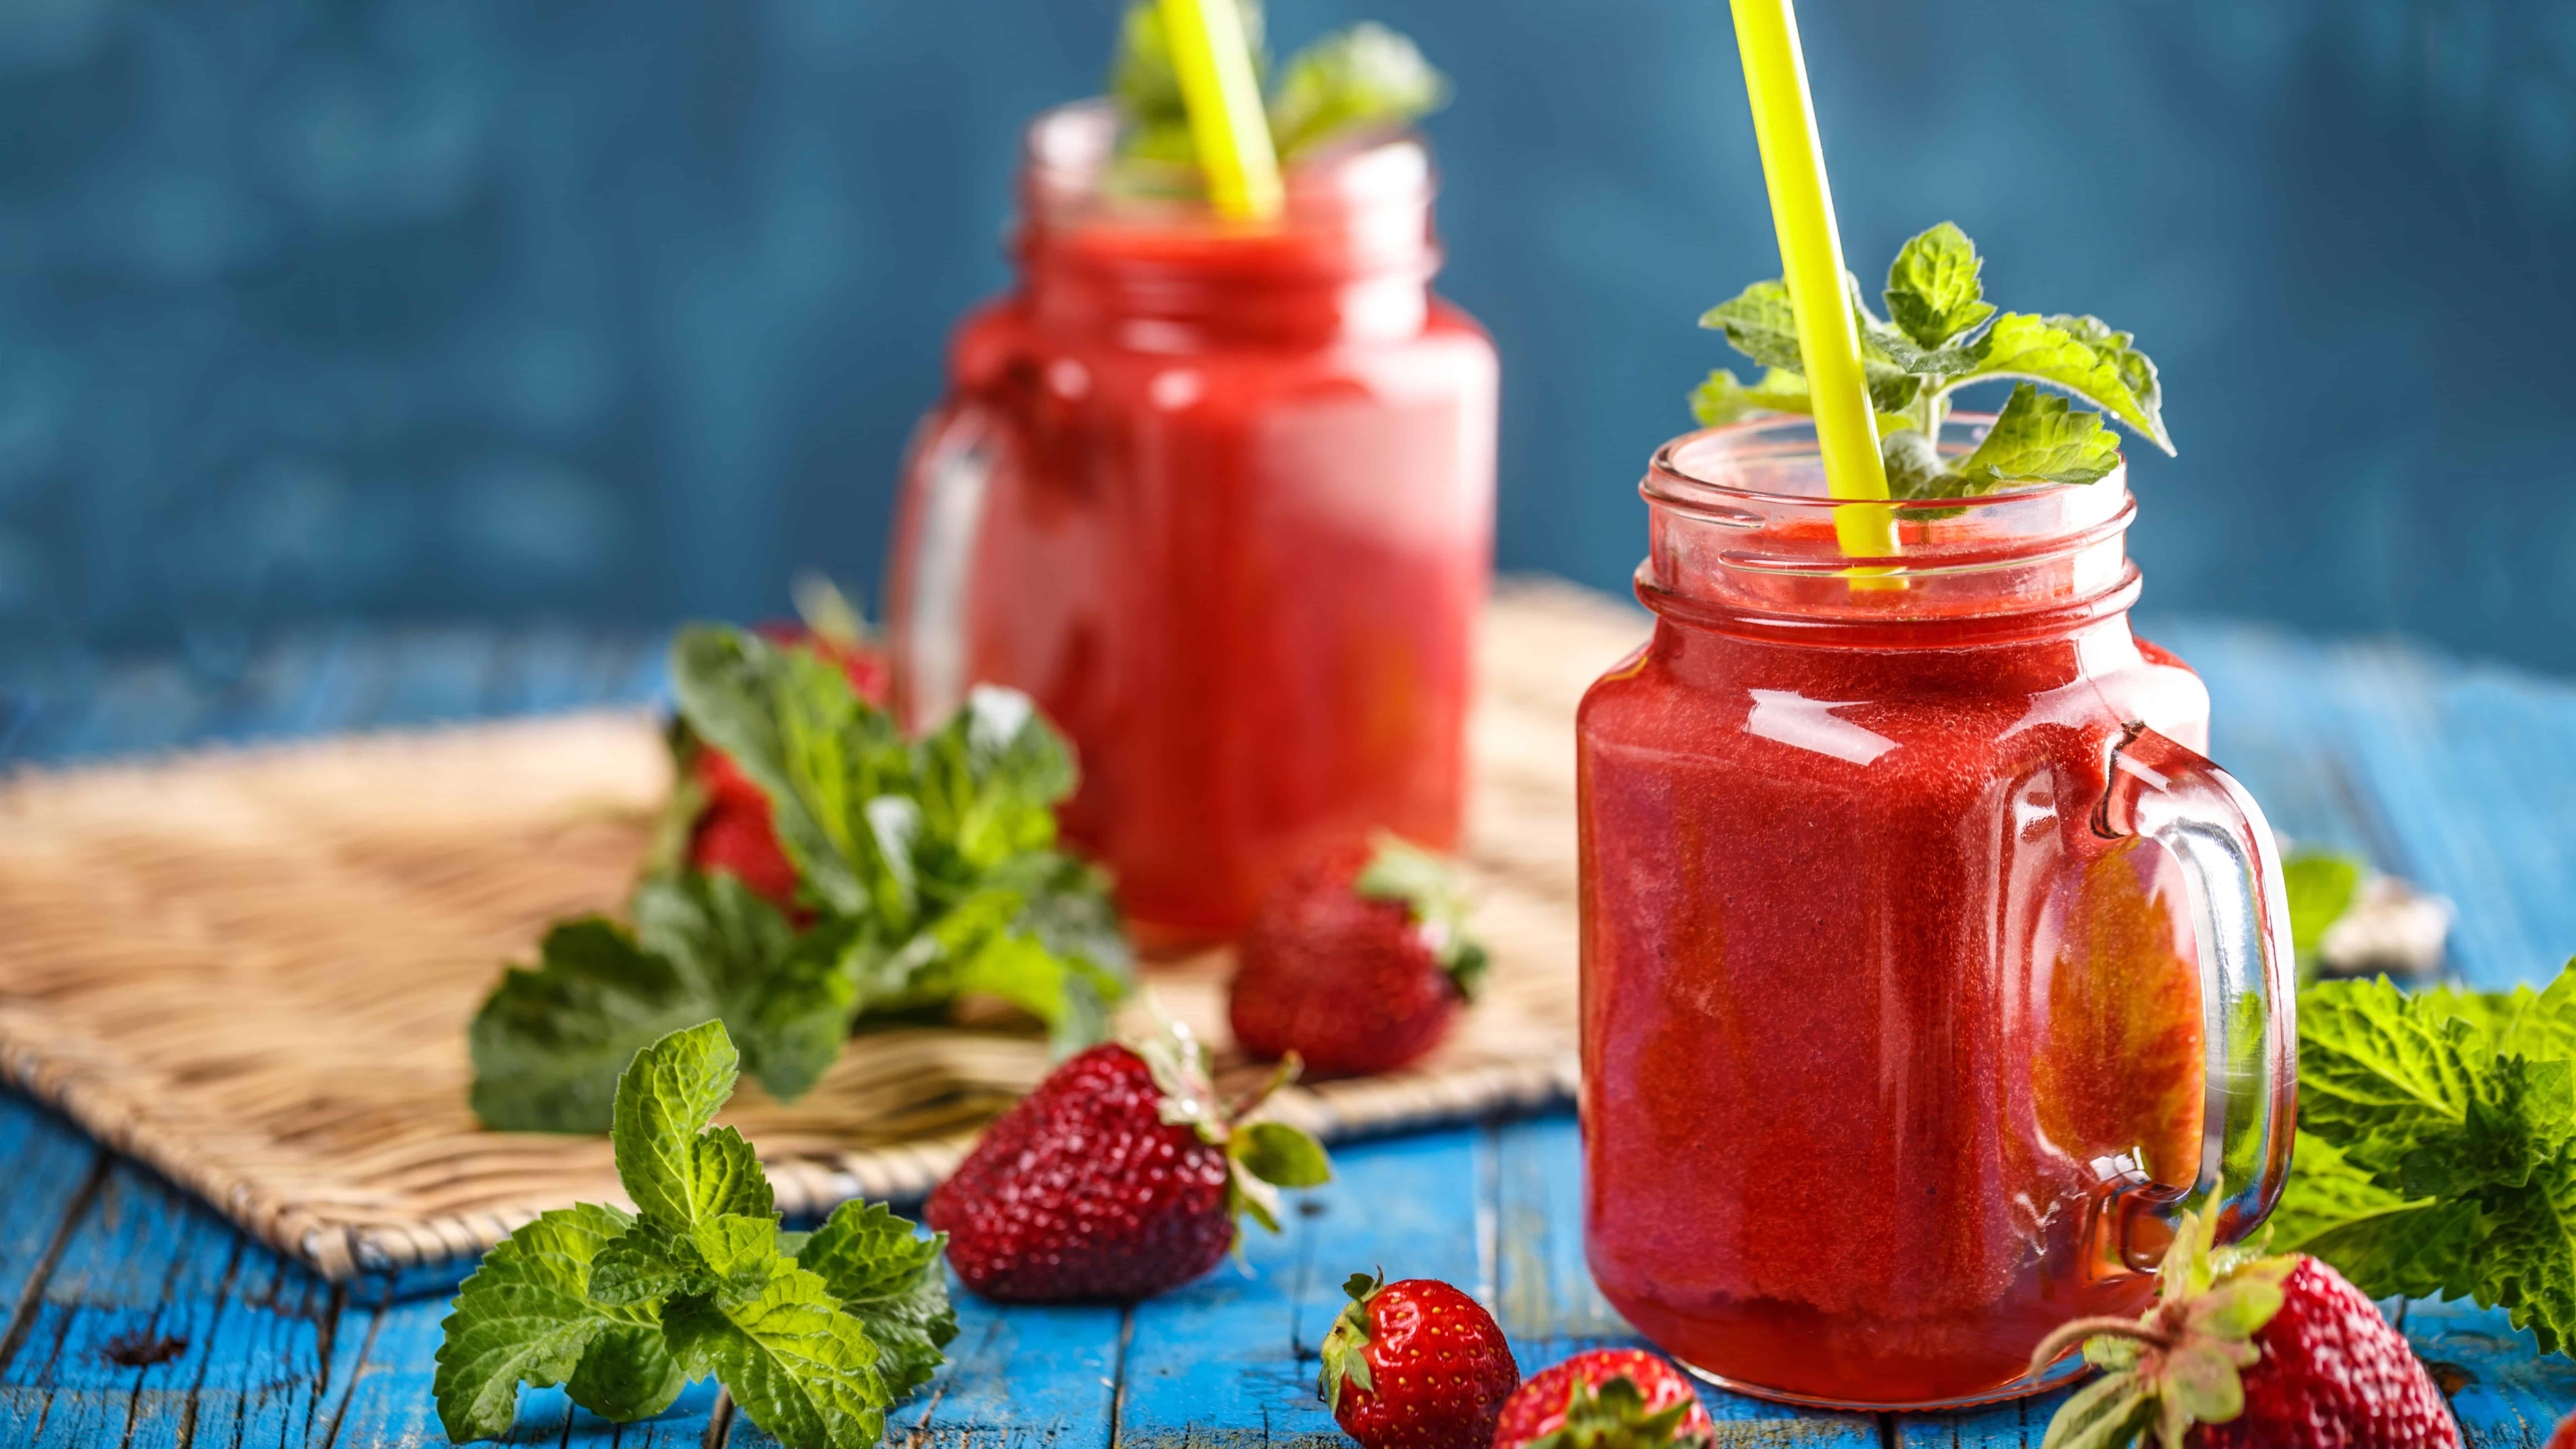 berry fruit smoothie uhd 8k wallpaper